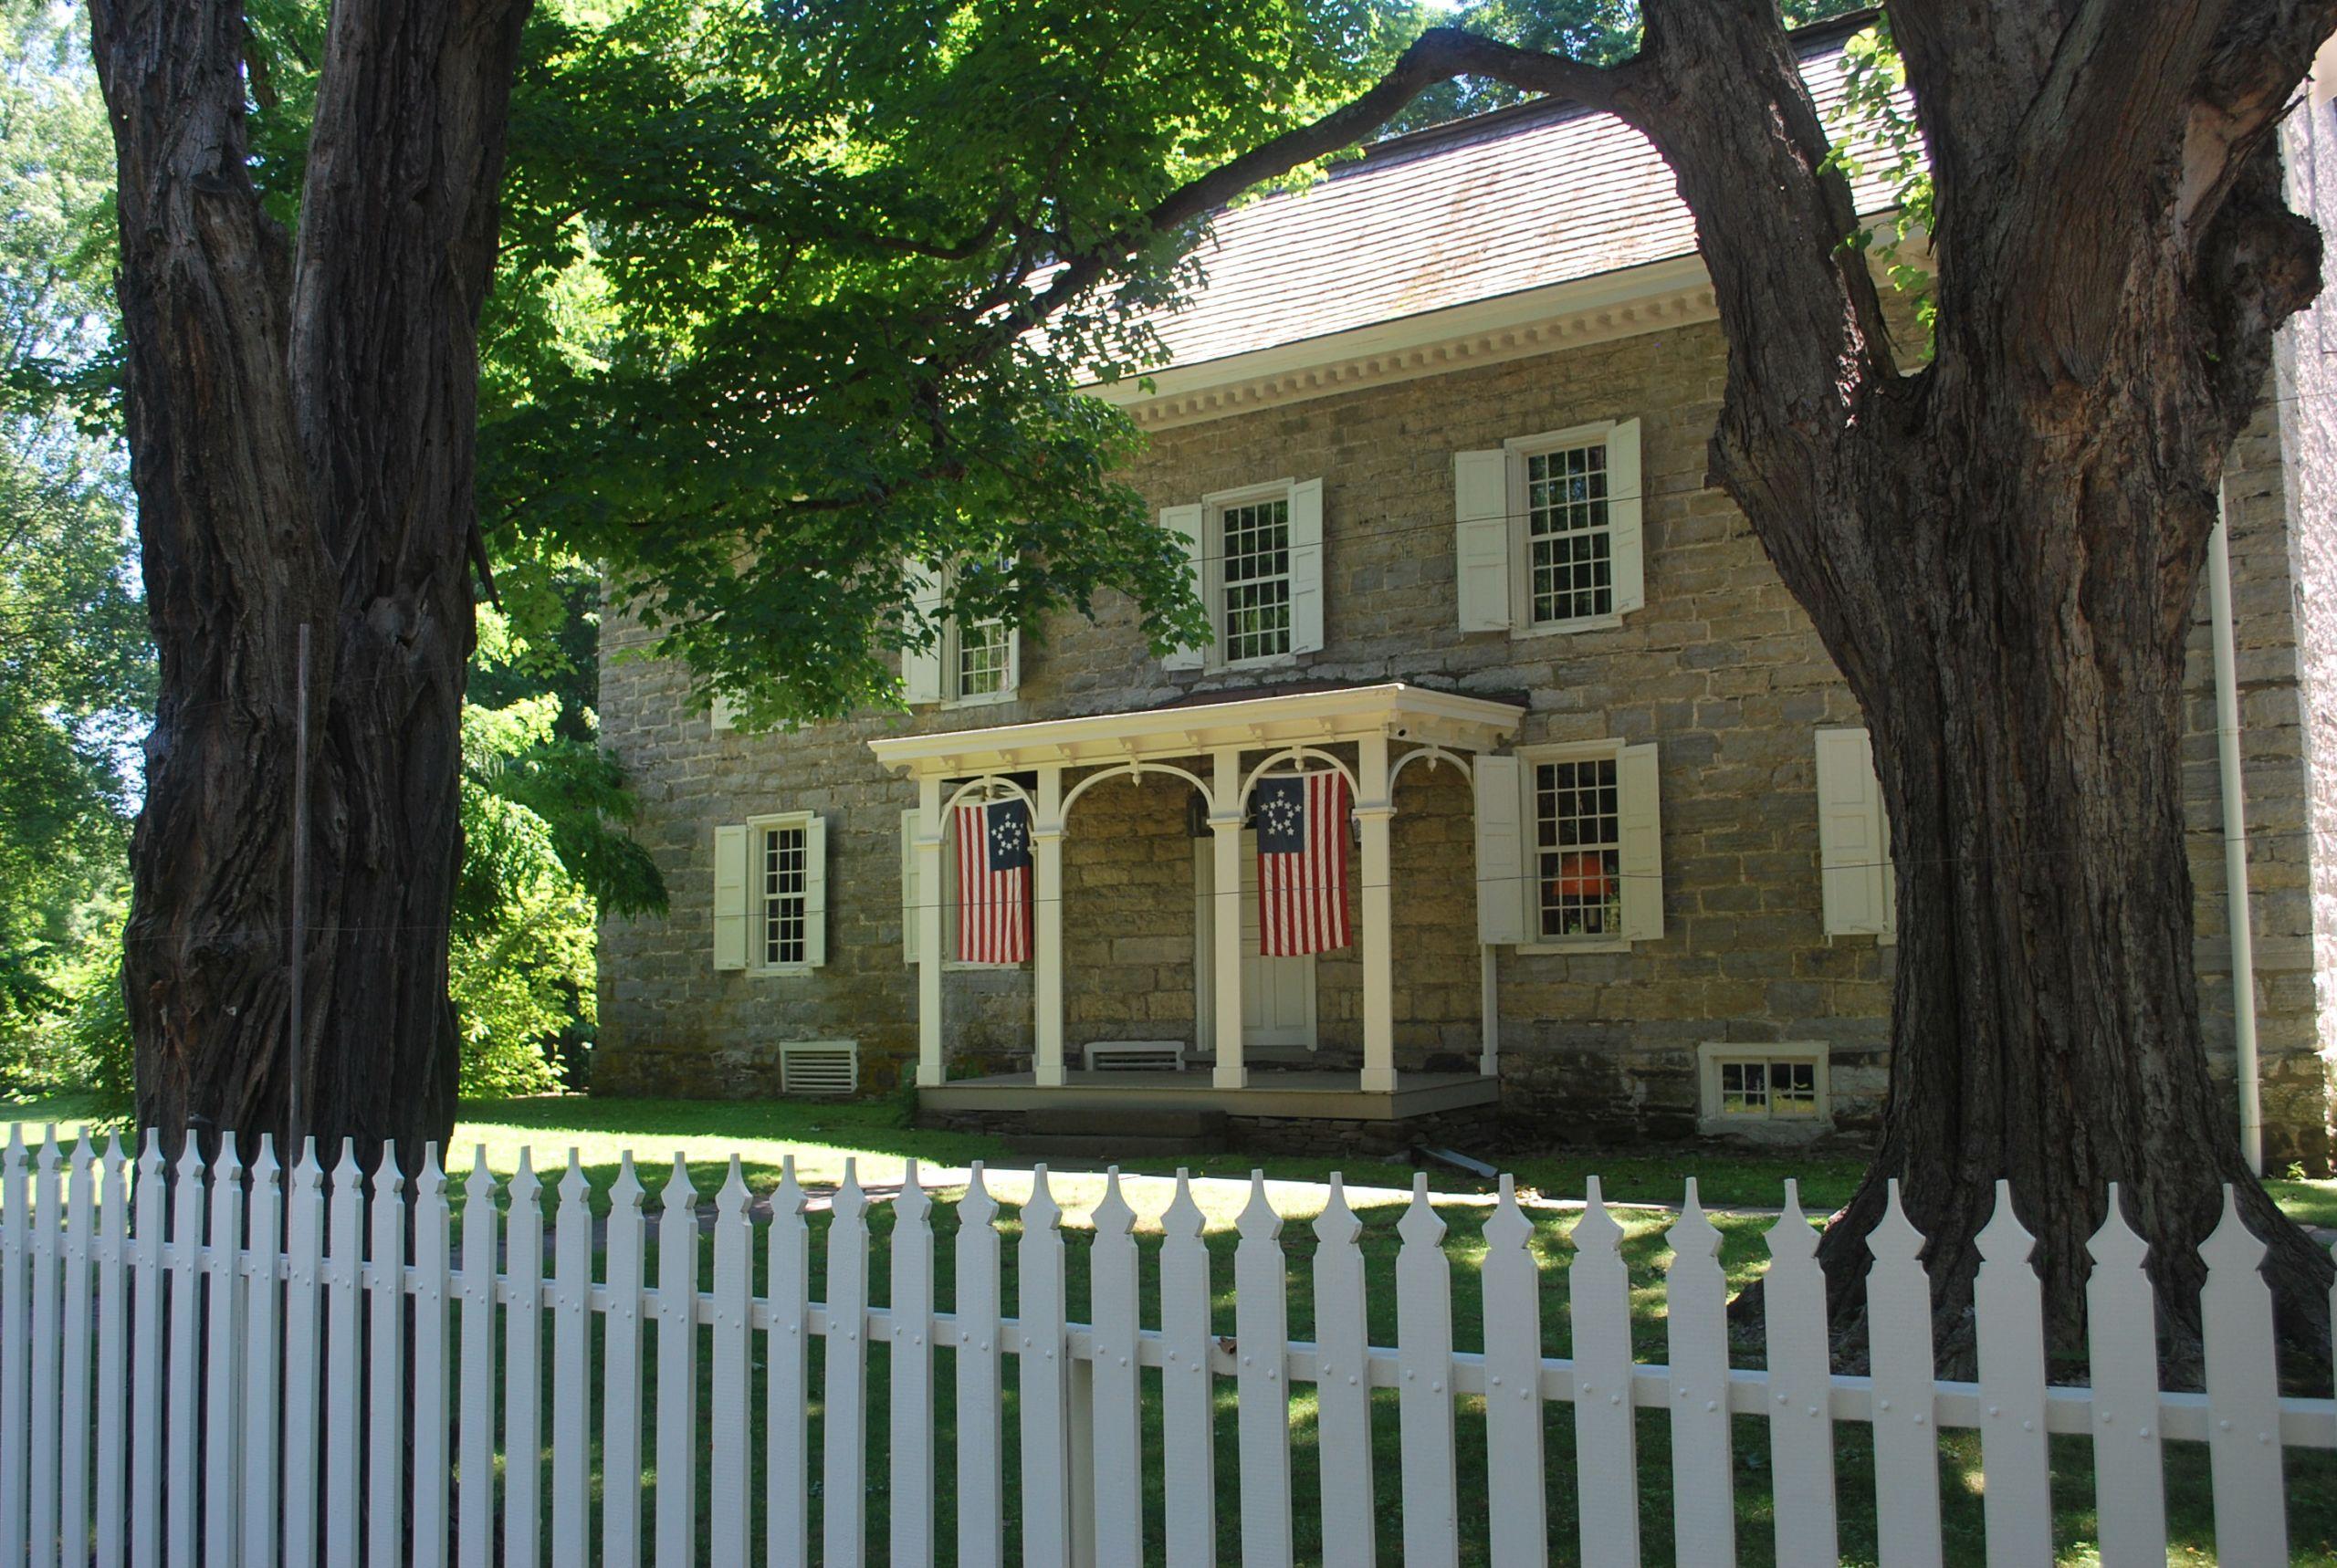 Historic Wynkoop House, Stone Ridge, Town of Marbletown